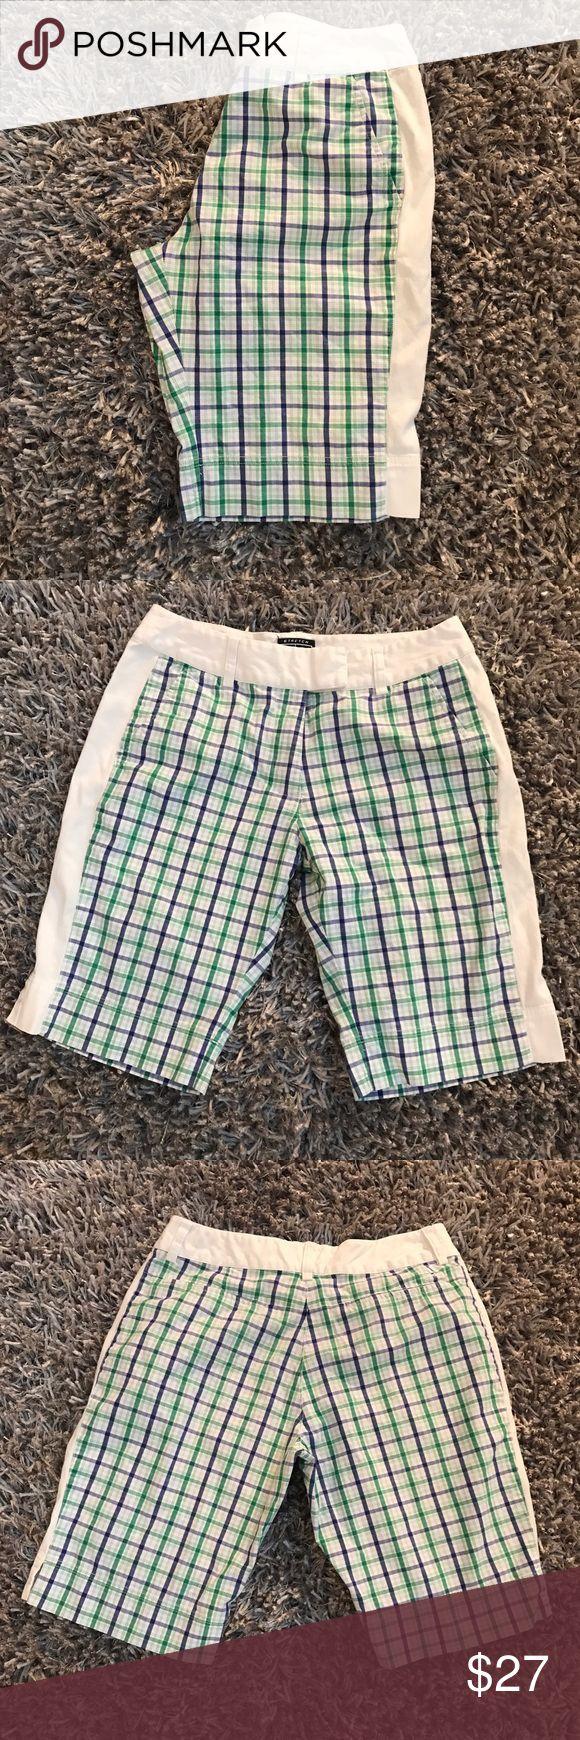 Adidas Golf Shorts White Plaid Women's 6 Stretch ⭐️️Women's Size 6  ⭐️️long Bermuda shorts  ⭐️️blue & green plaid  ⭐️️Approx Measurements:  Soon to come  060317-2 🚫trades please adidas Shorts Bermudas